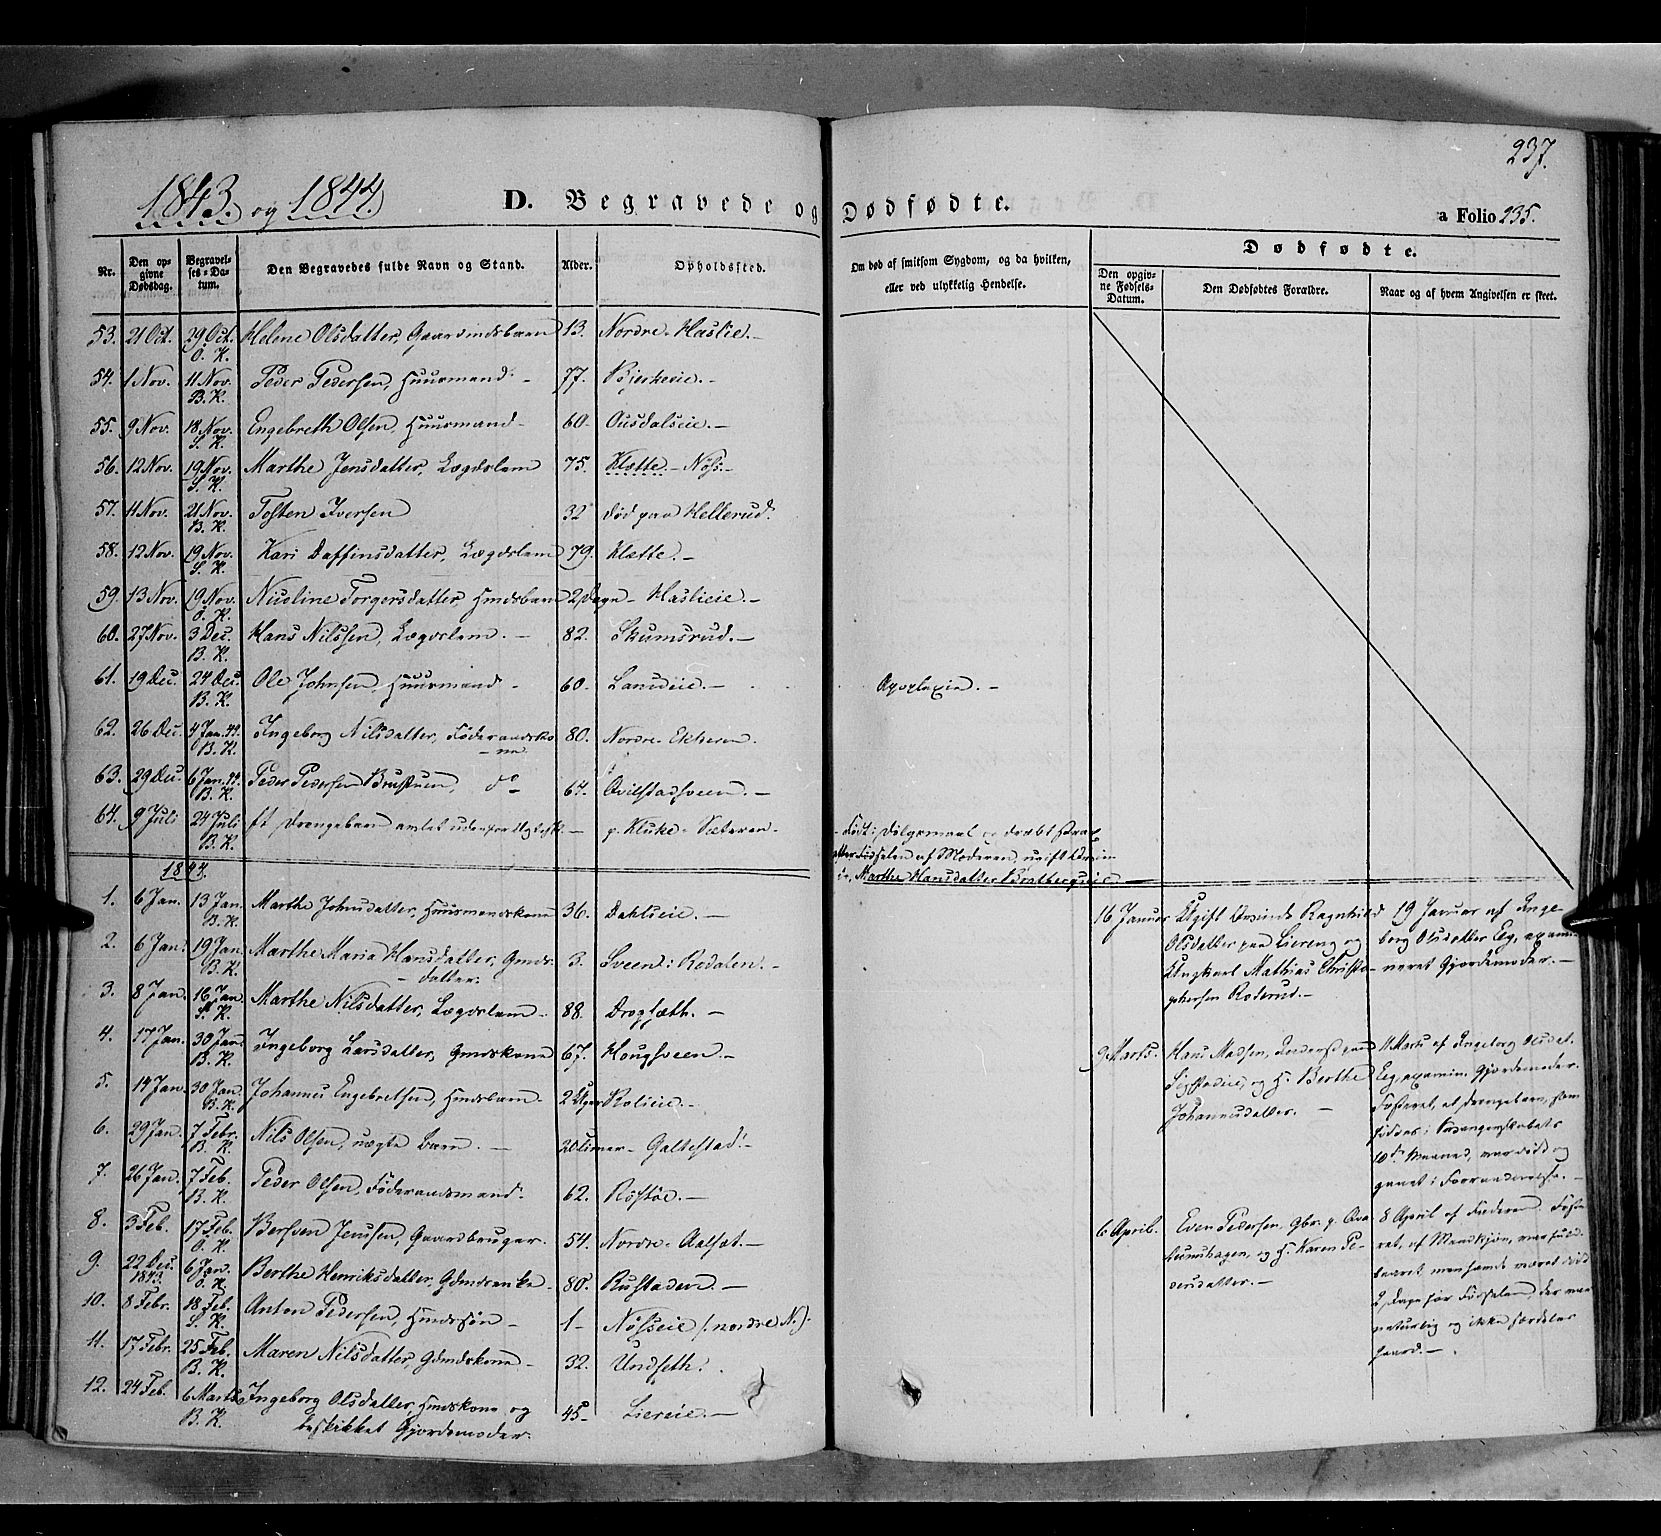 SAH, Biri prestekontor, Ministerialbok nr. 5, 1843-1854, s. 237